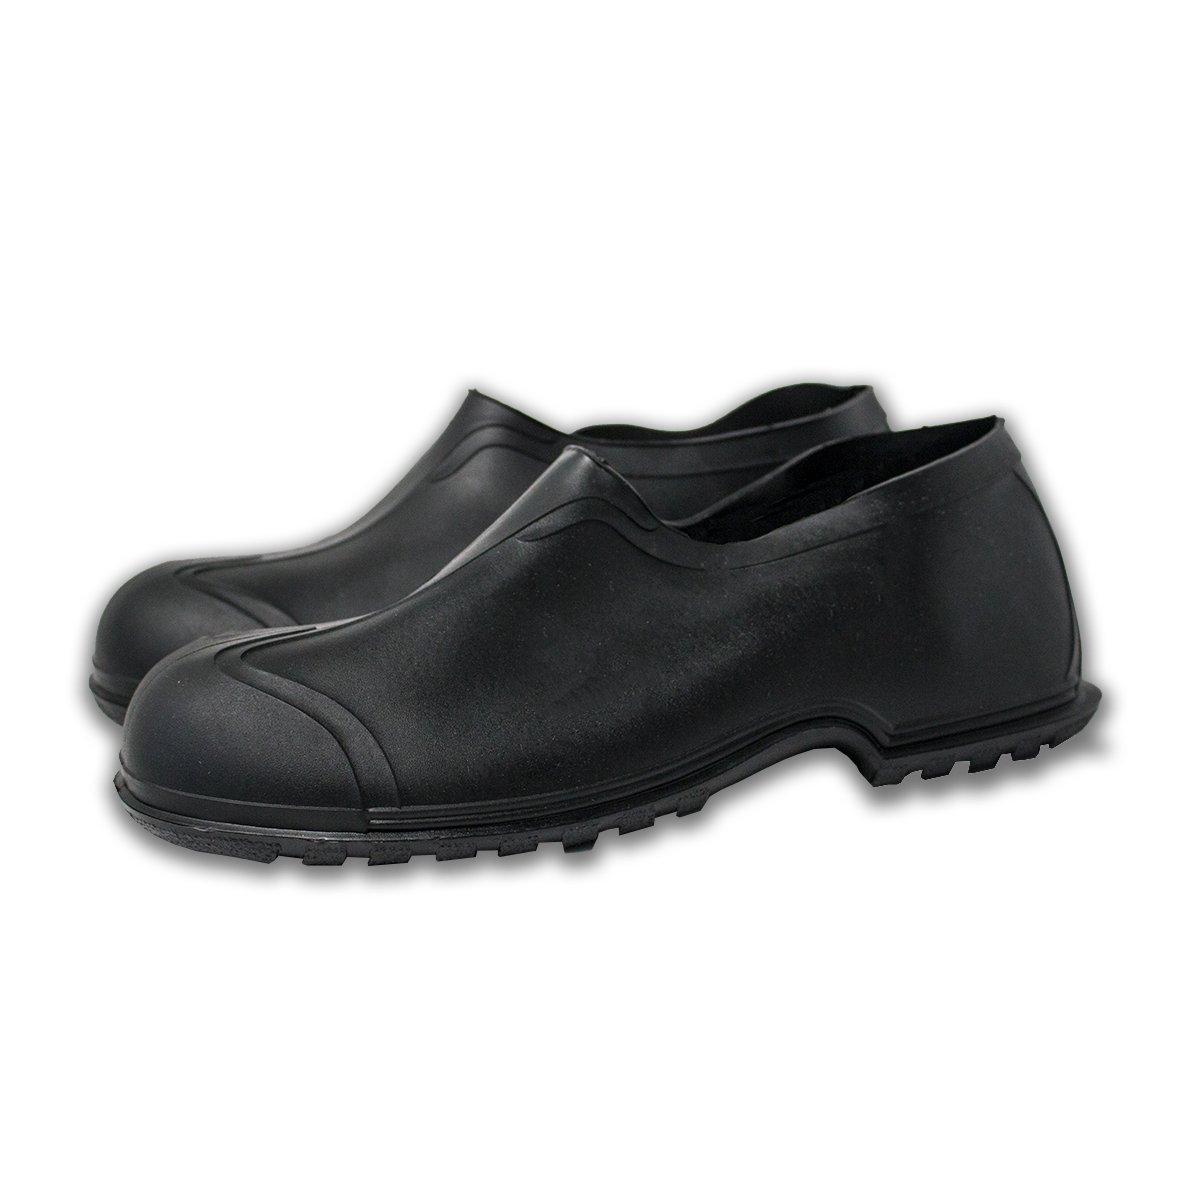 "UltraSource 440095-2XL PVC Overshoes, 4"", Black, Size 2X-Large (14-15)"